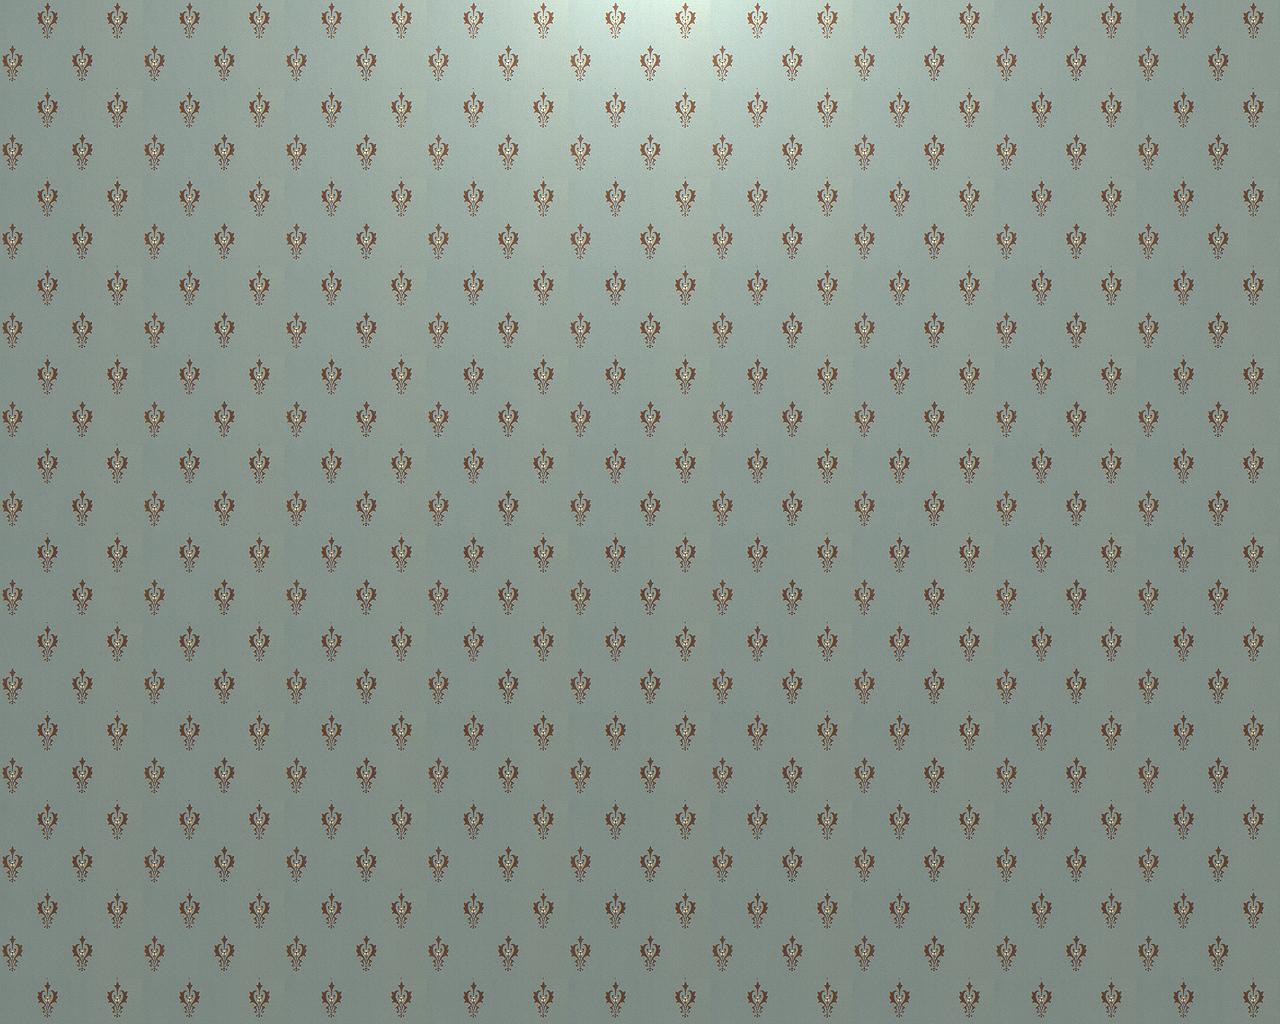 Victorian Pattern II Vert deau Light 1280x1024